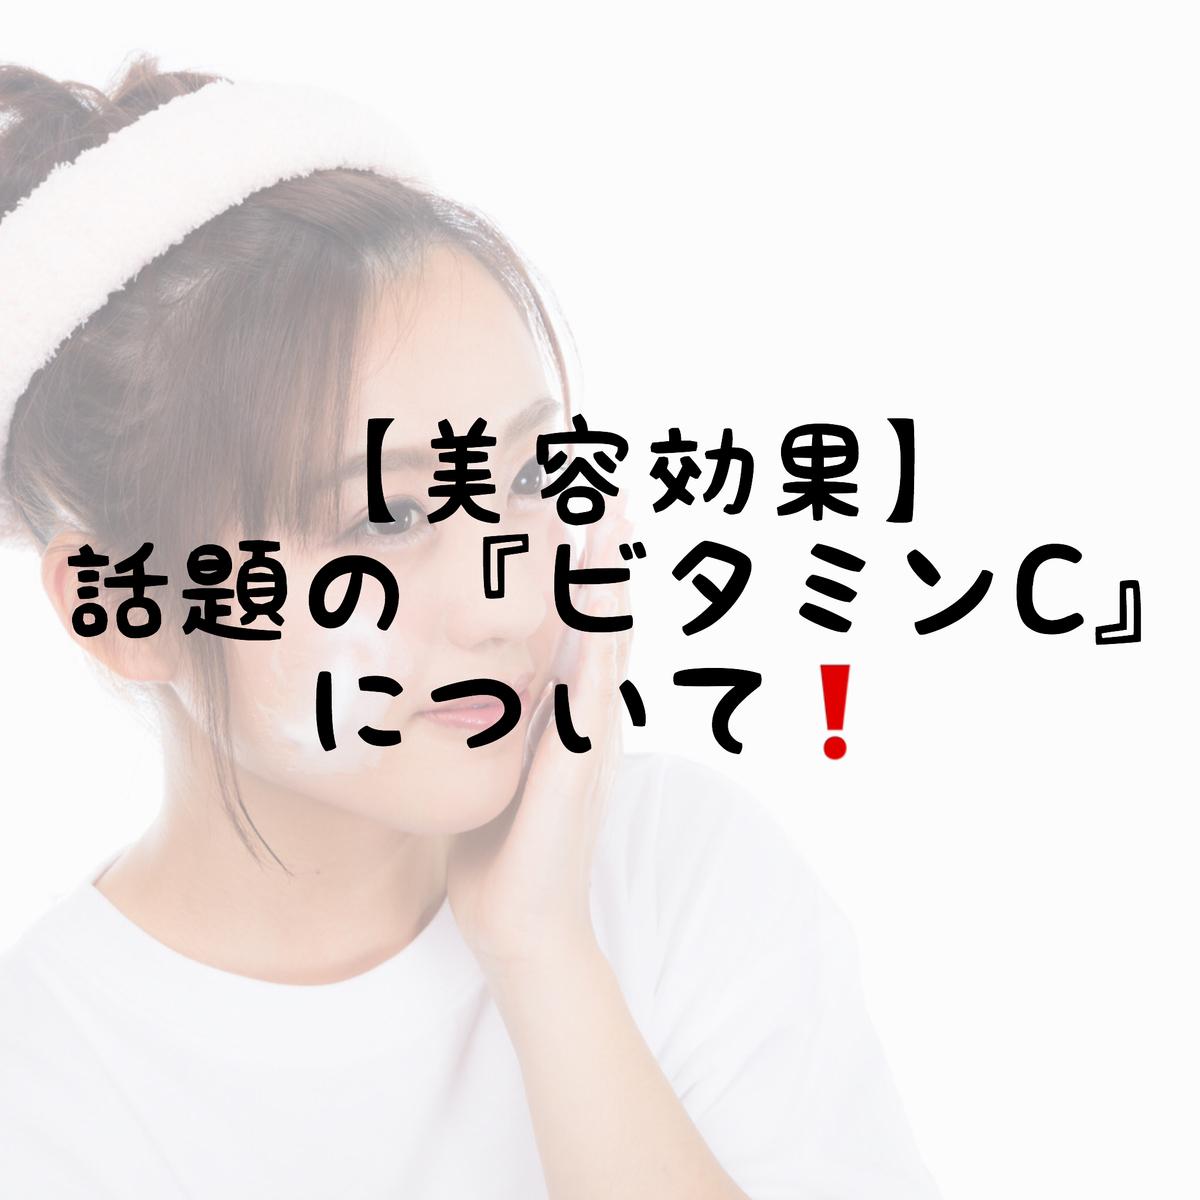 f:id:nokonoko_o:20200517165458j:plain